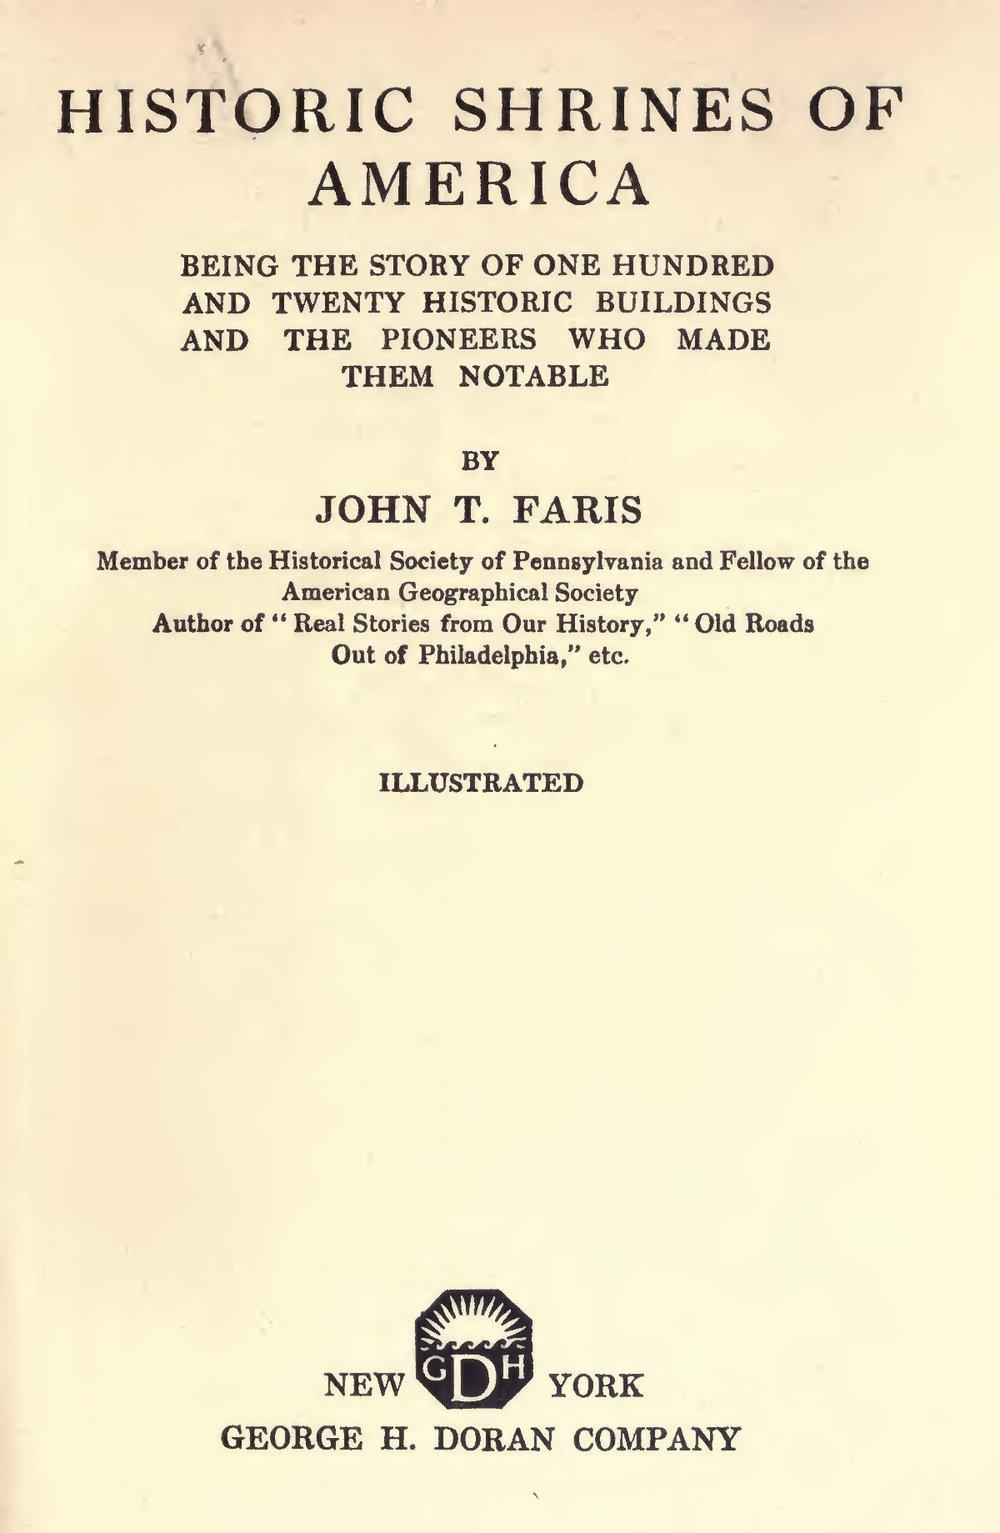 Faris, John Thomson, Historic Shrines of America Title Page.jpg